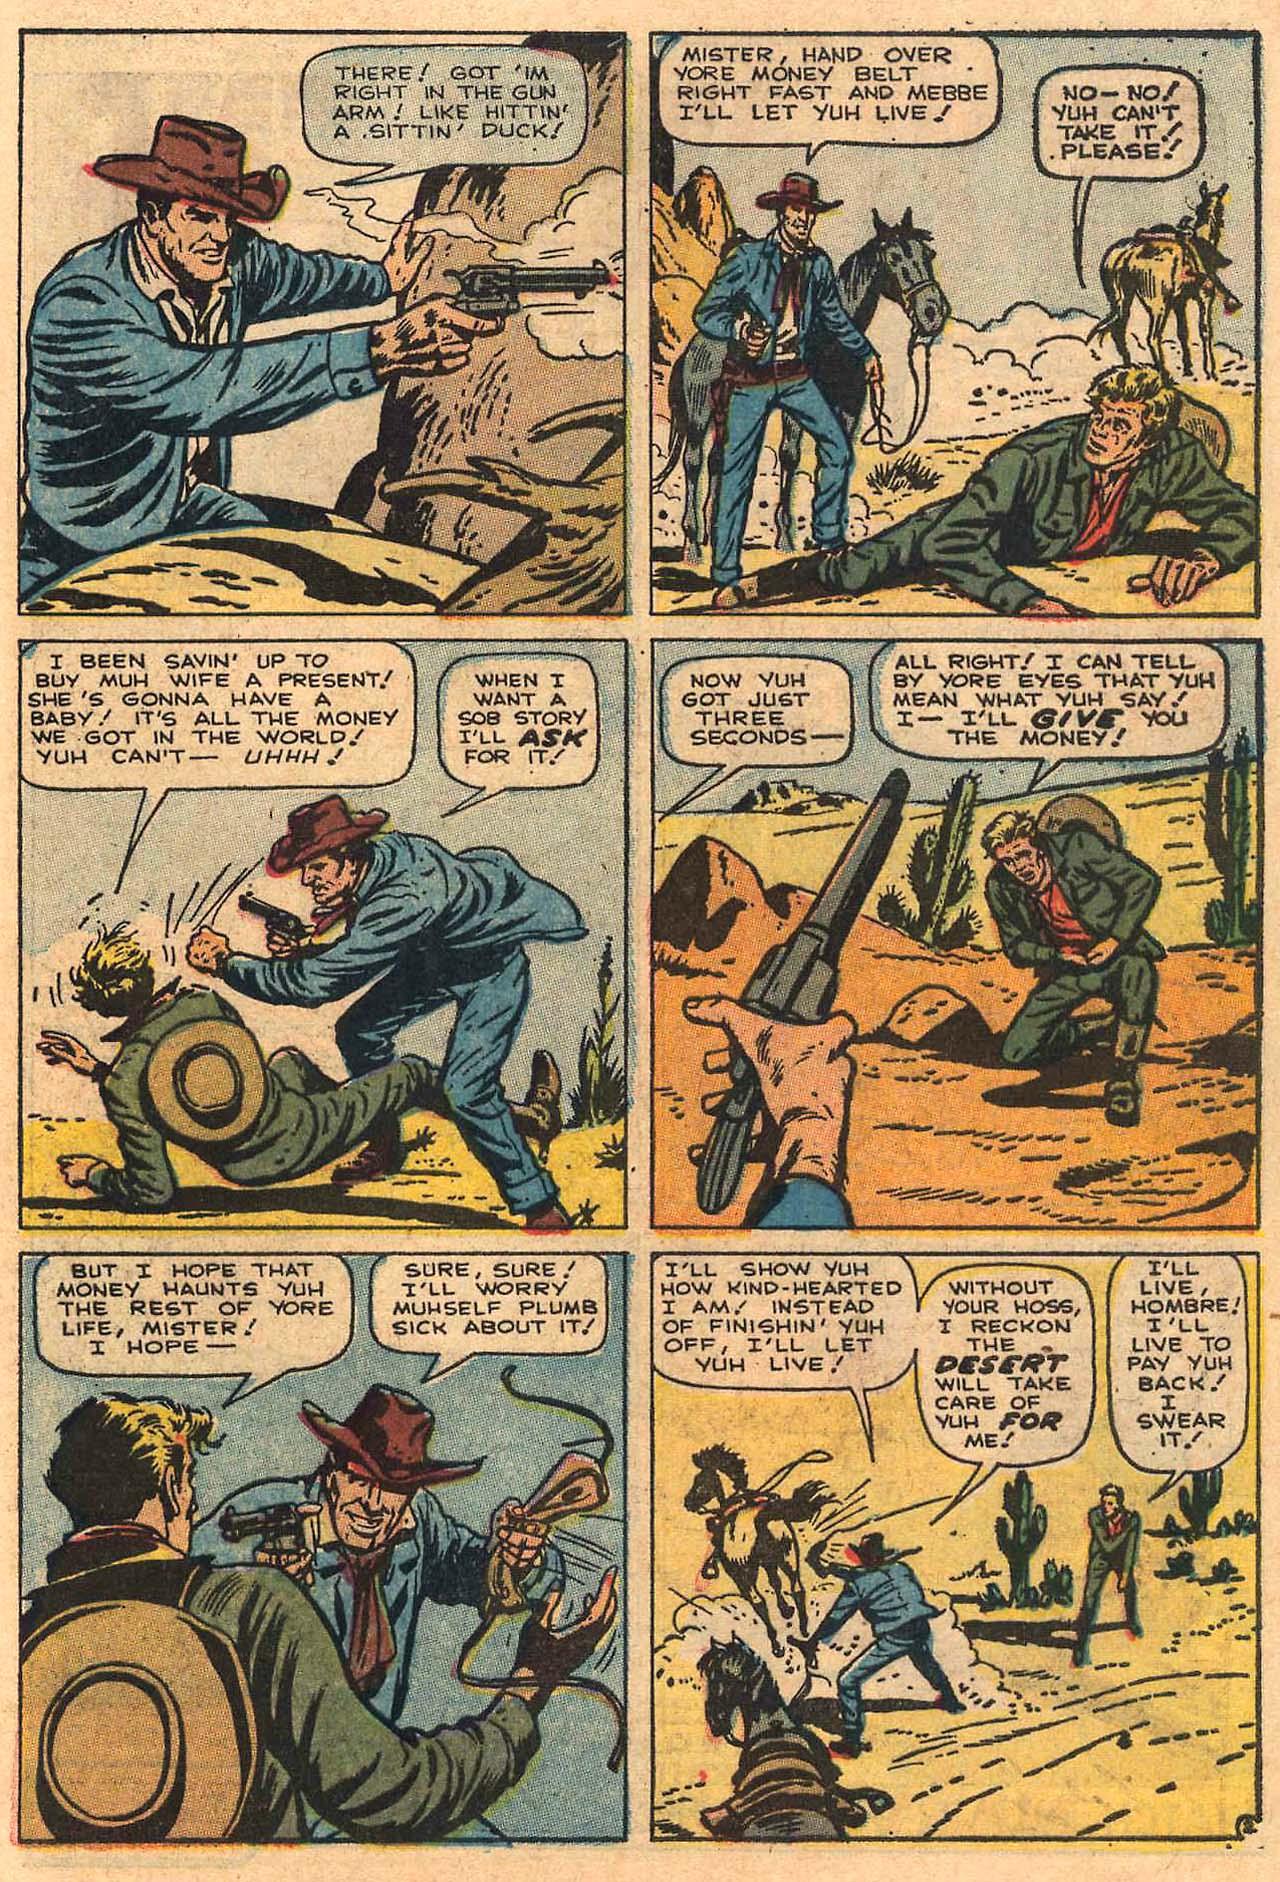 Read online Two-Gun Kid comic -  Issue #84 - 27